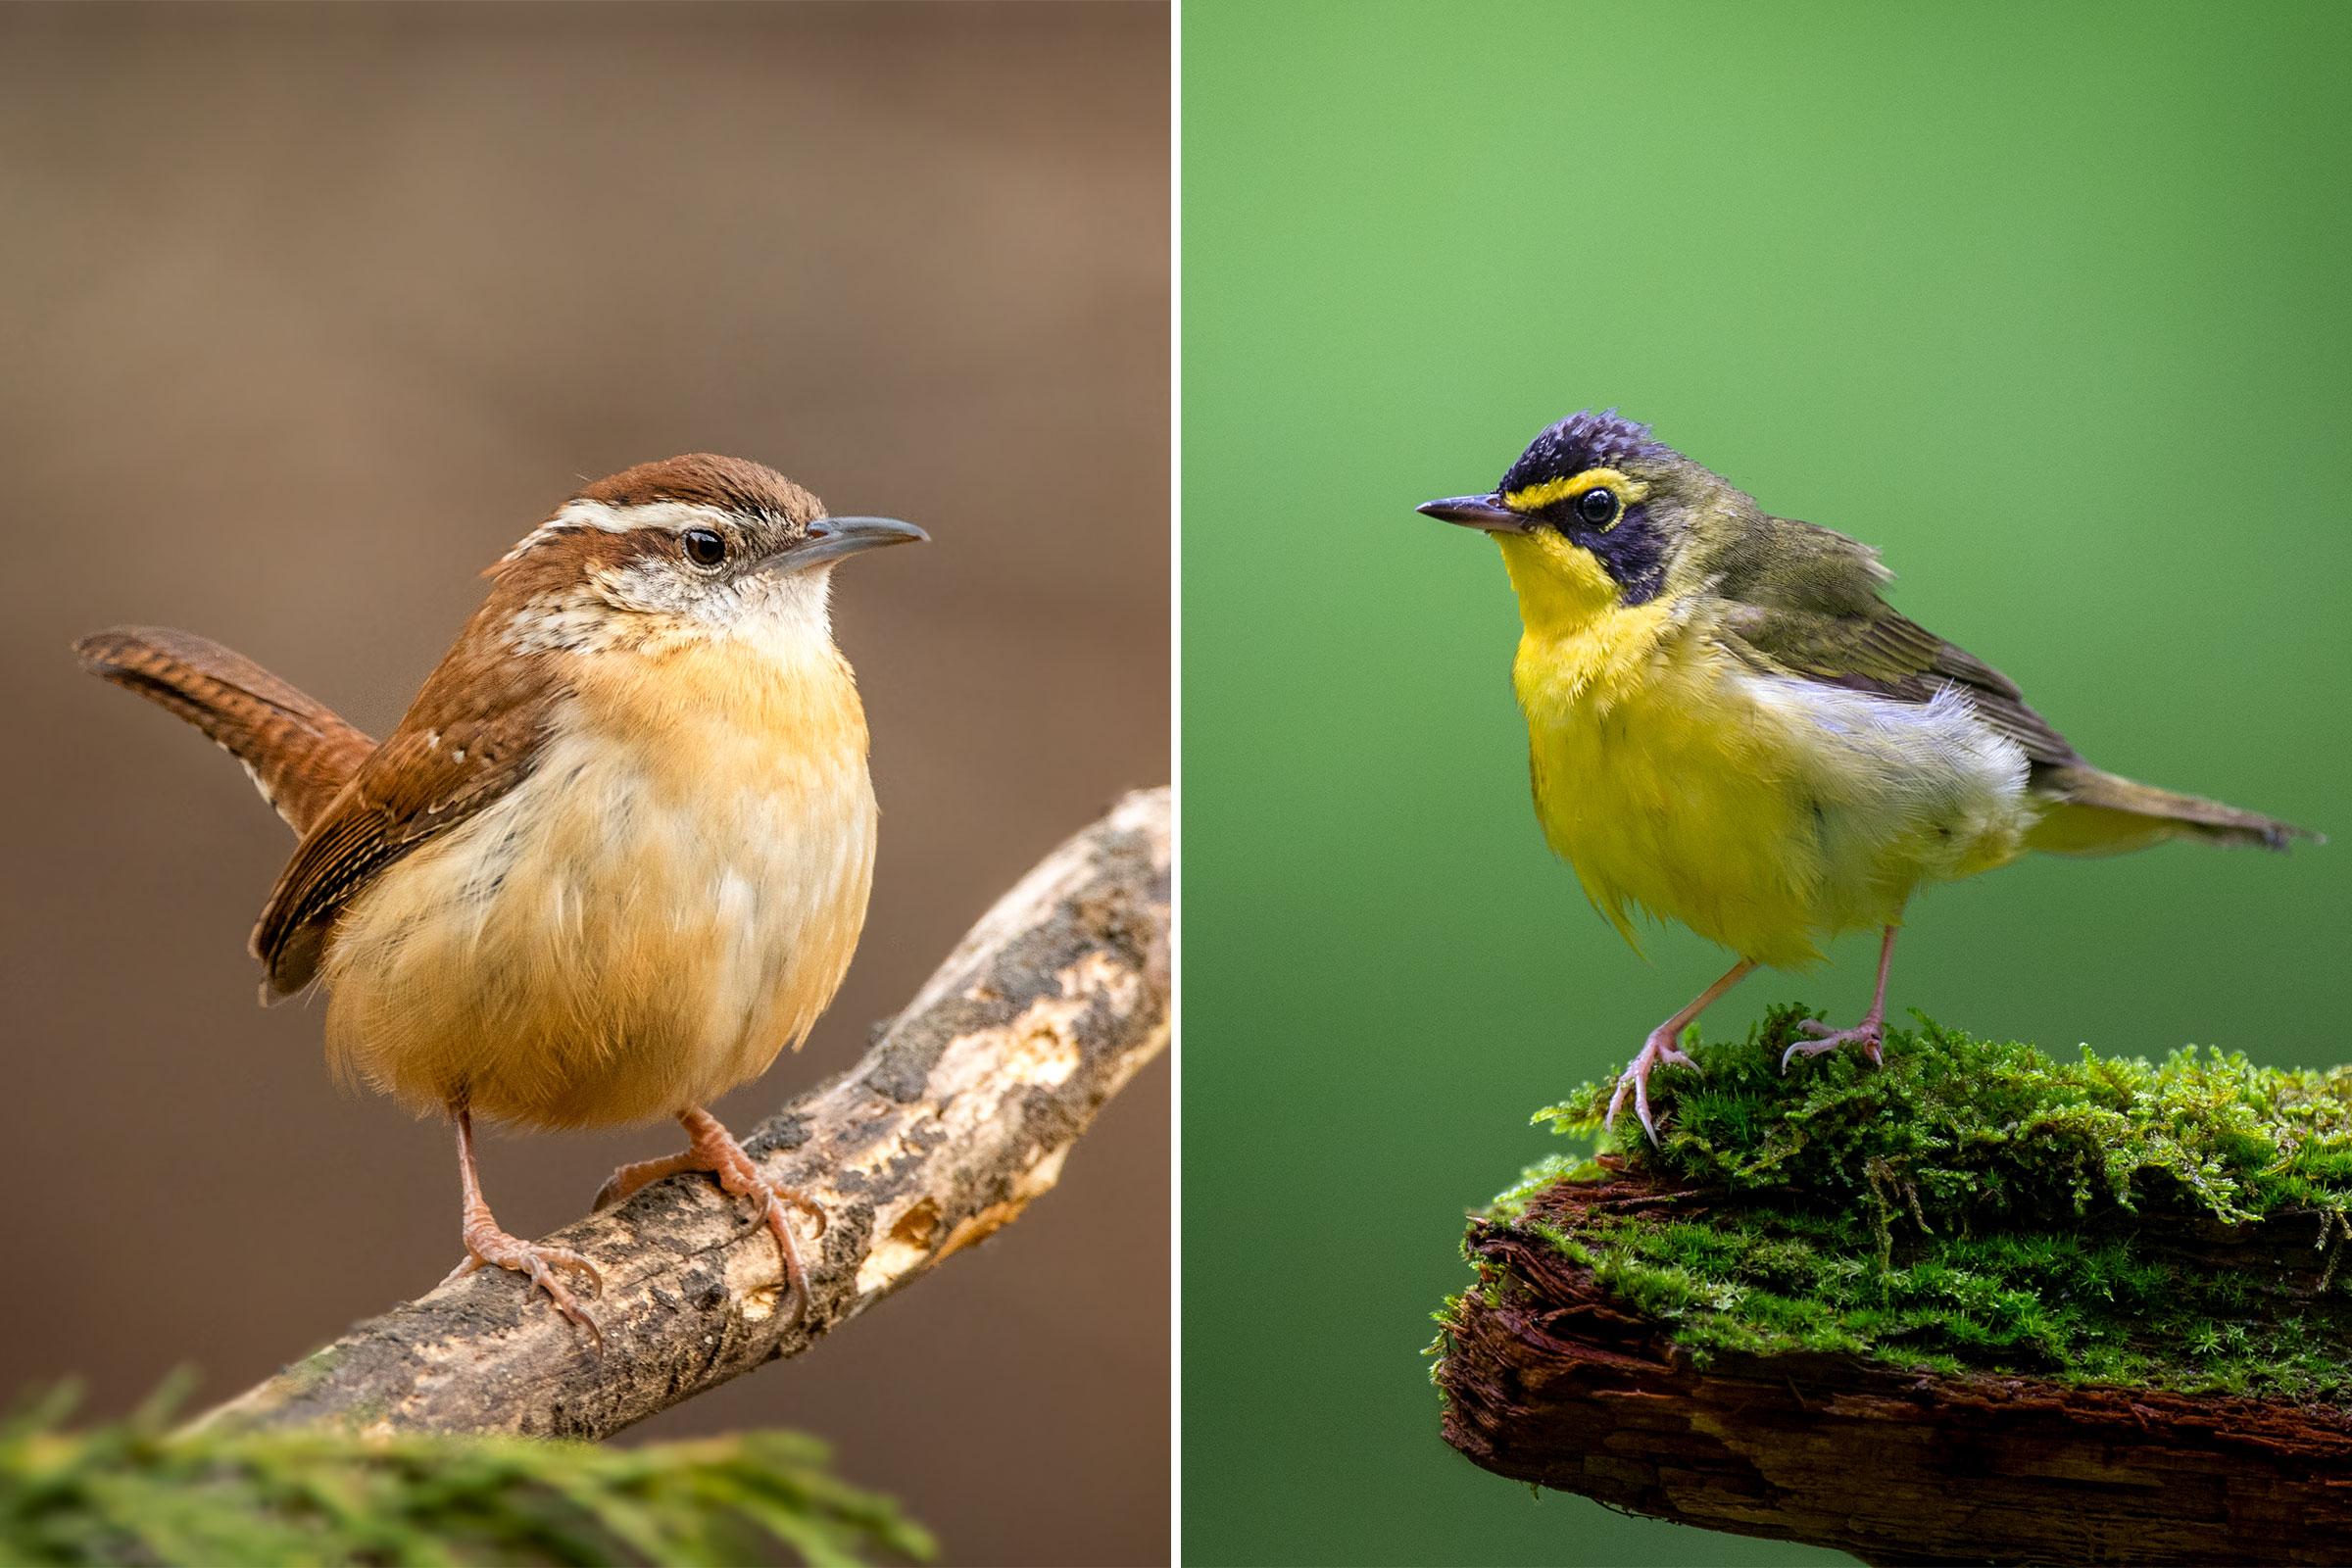 Photos from left: Carolina Wren, Jenny Burdette/Great Backyard Bird Count; Kentucky Warbler, Ray Hennessy/iStock